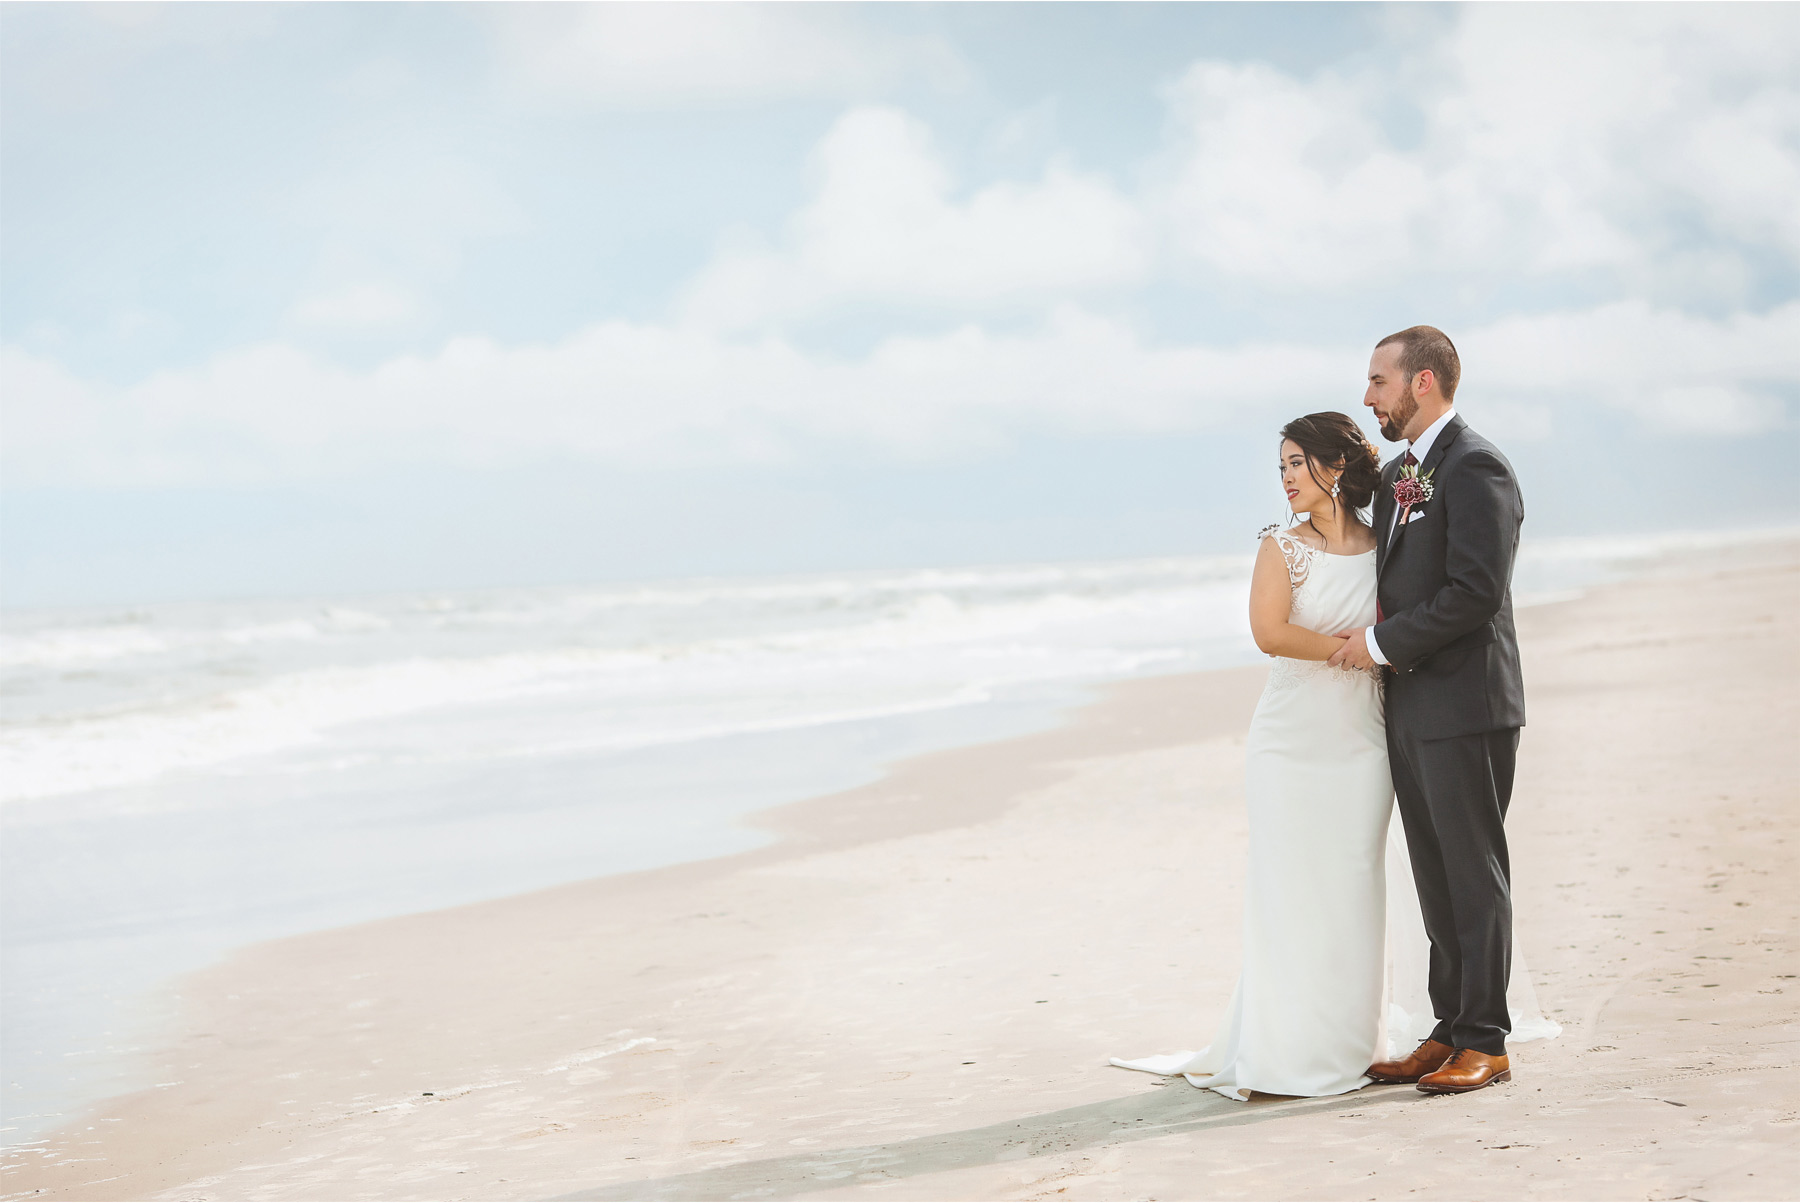 20-South-Carolina-Wedding-by-Vick-Photography-Hilton-Head-Island-Omni-Oceanfront-Hotel-Destination-Beach-Ocean-Bride-Groom-Sand-Felyn-and-Will.jpg